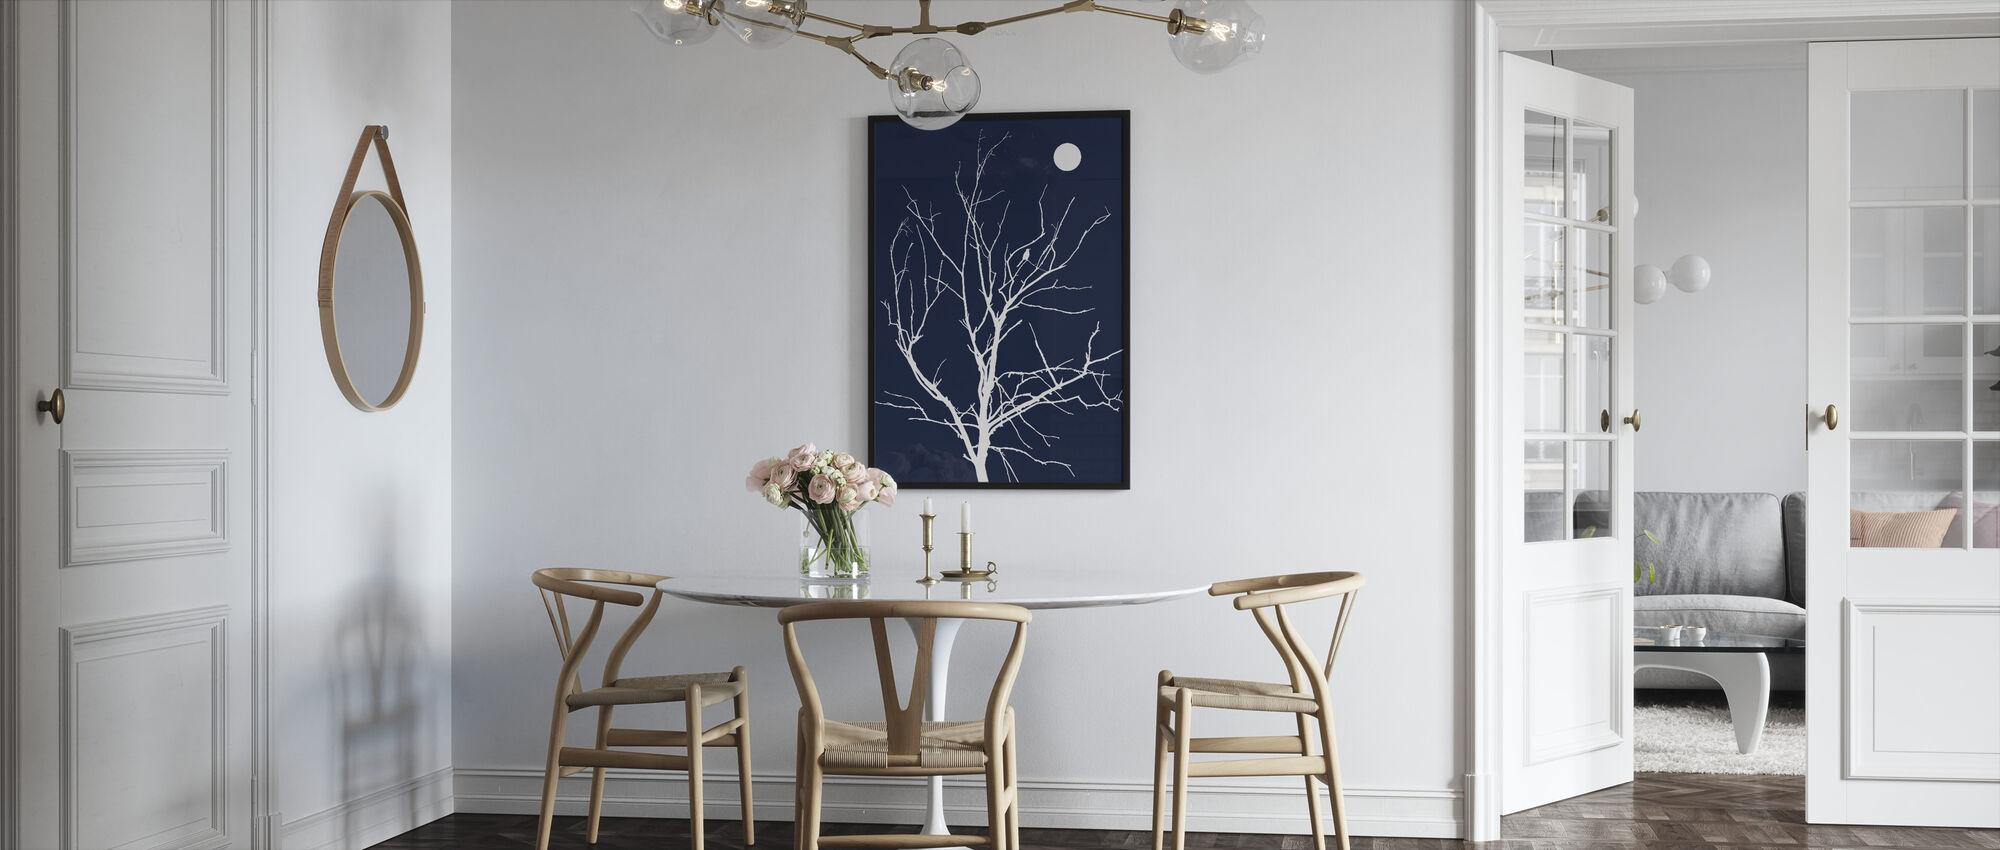 Lonely Bird Night Moon - Framed print - Kitchen